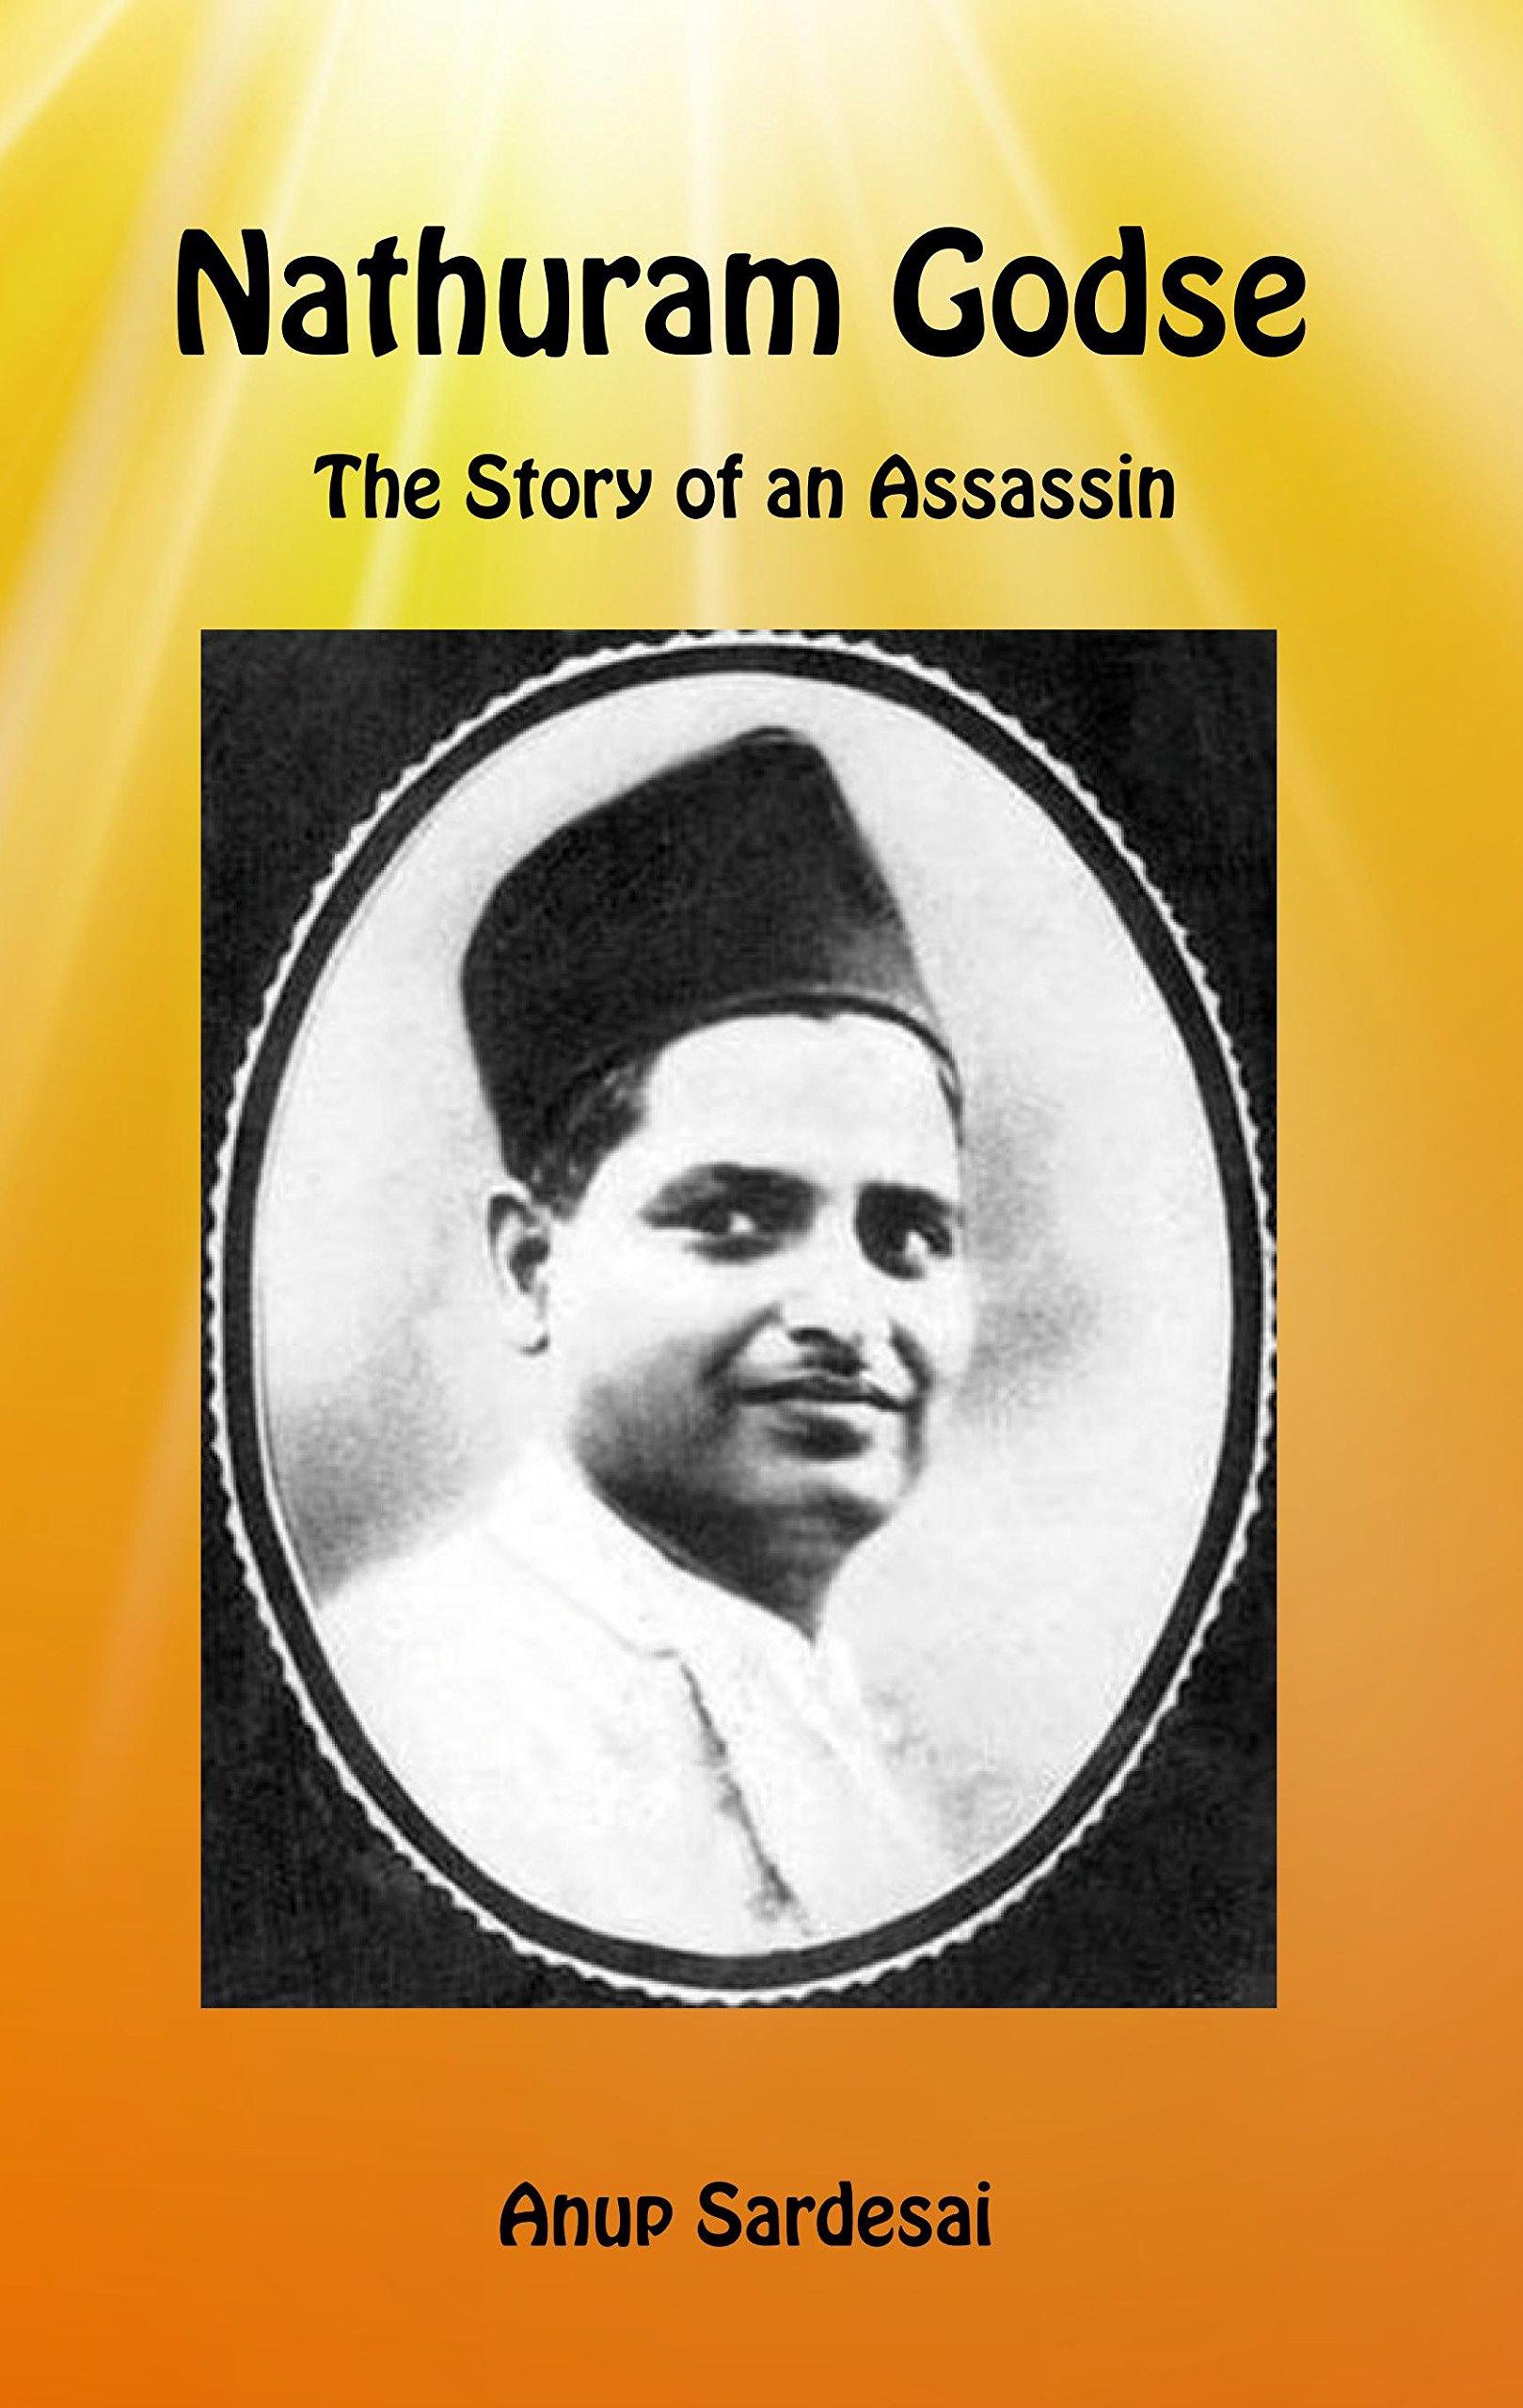 Why I Assassinated Gandhi